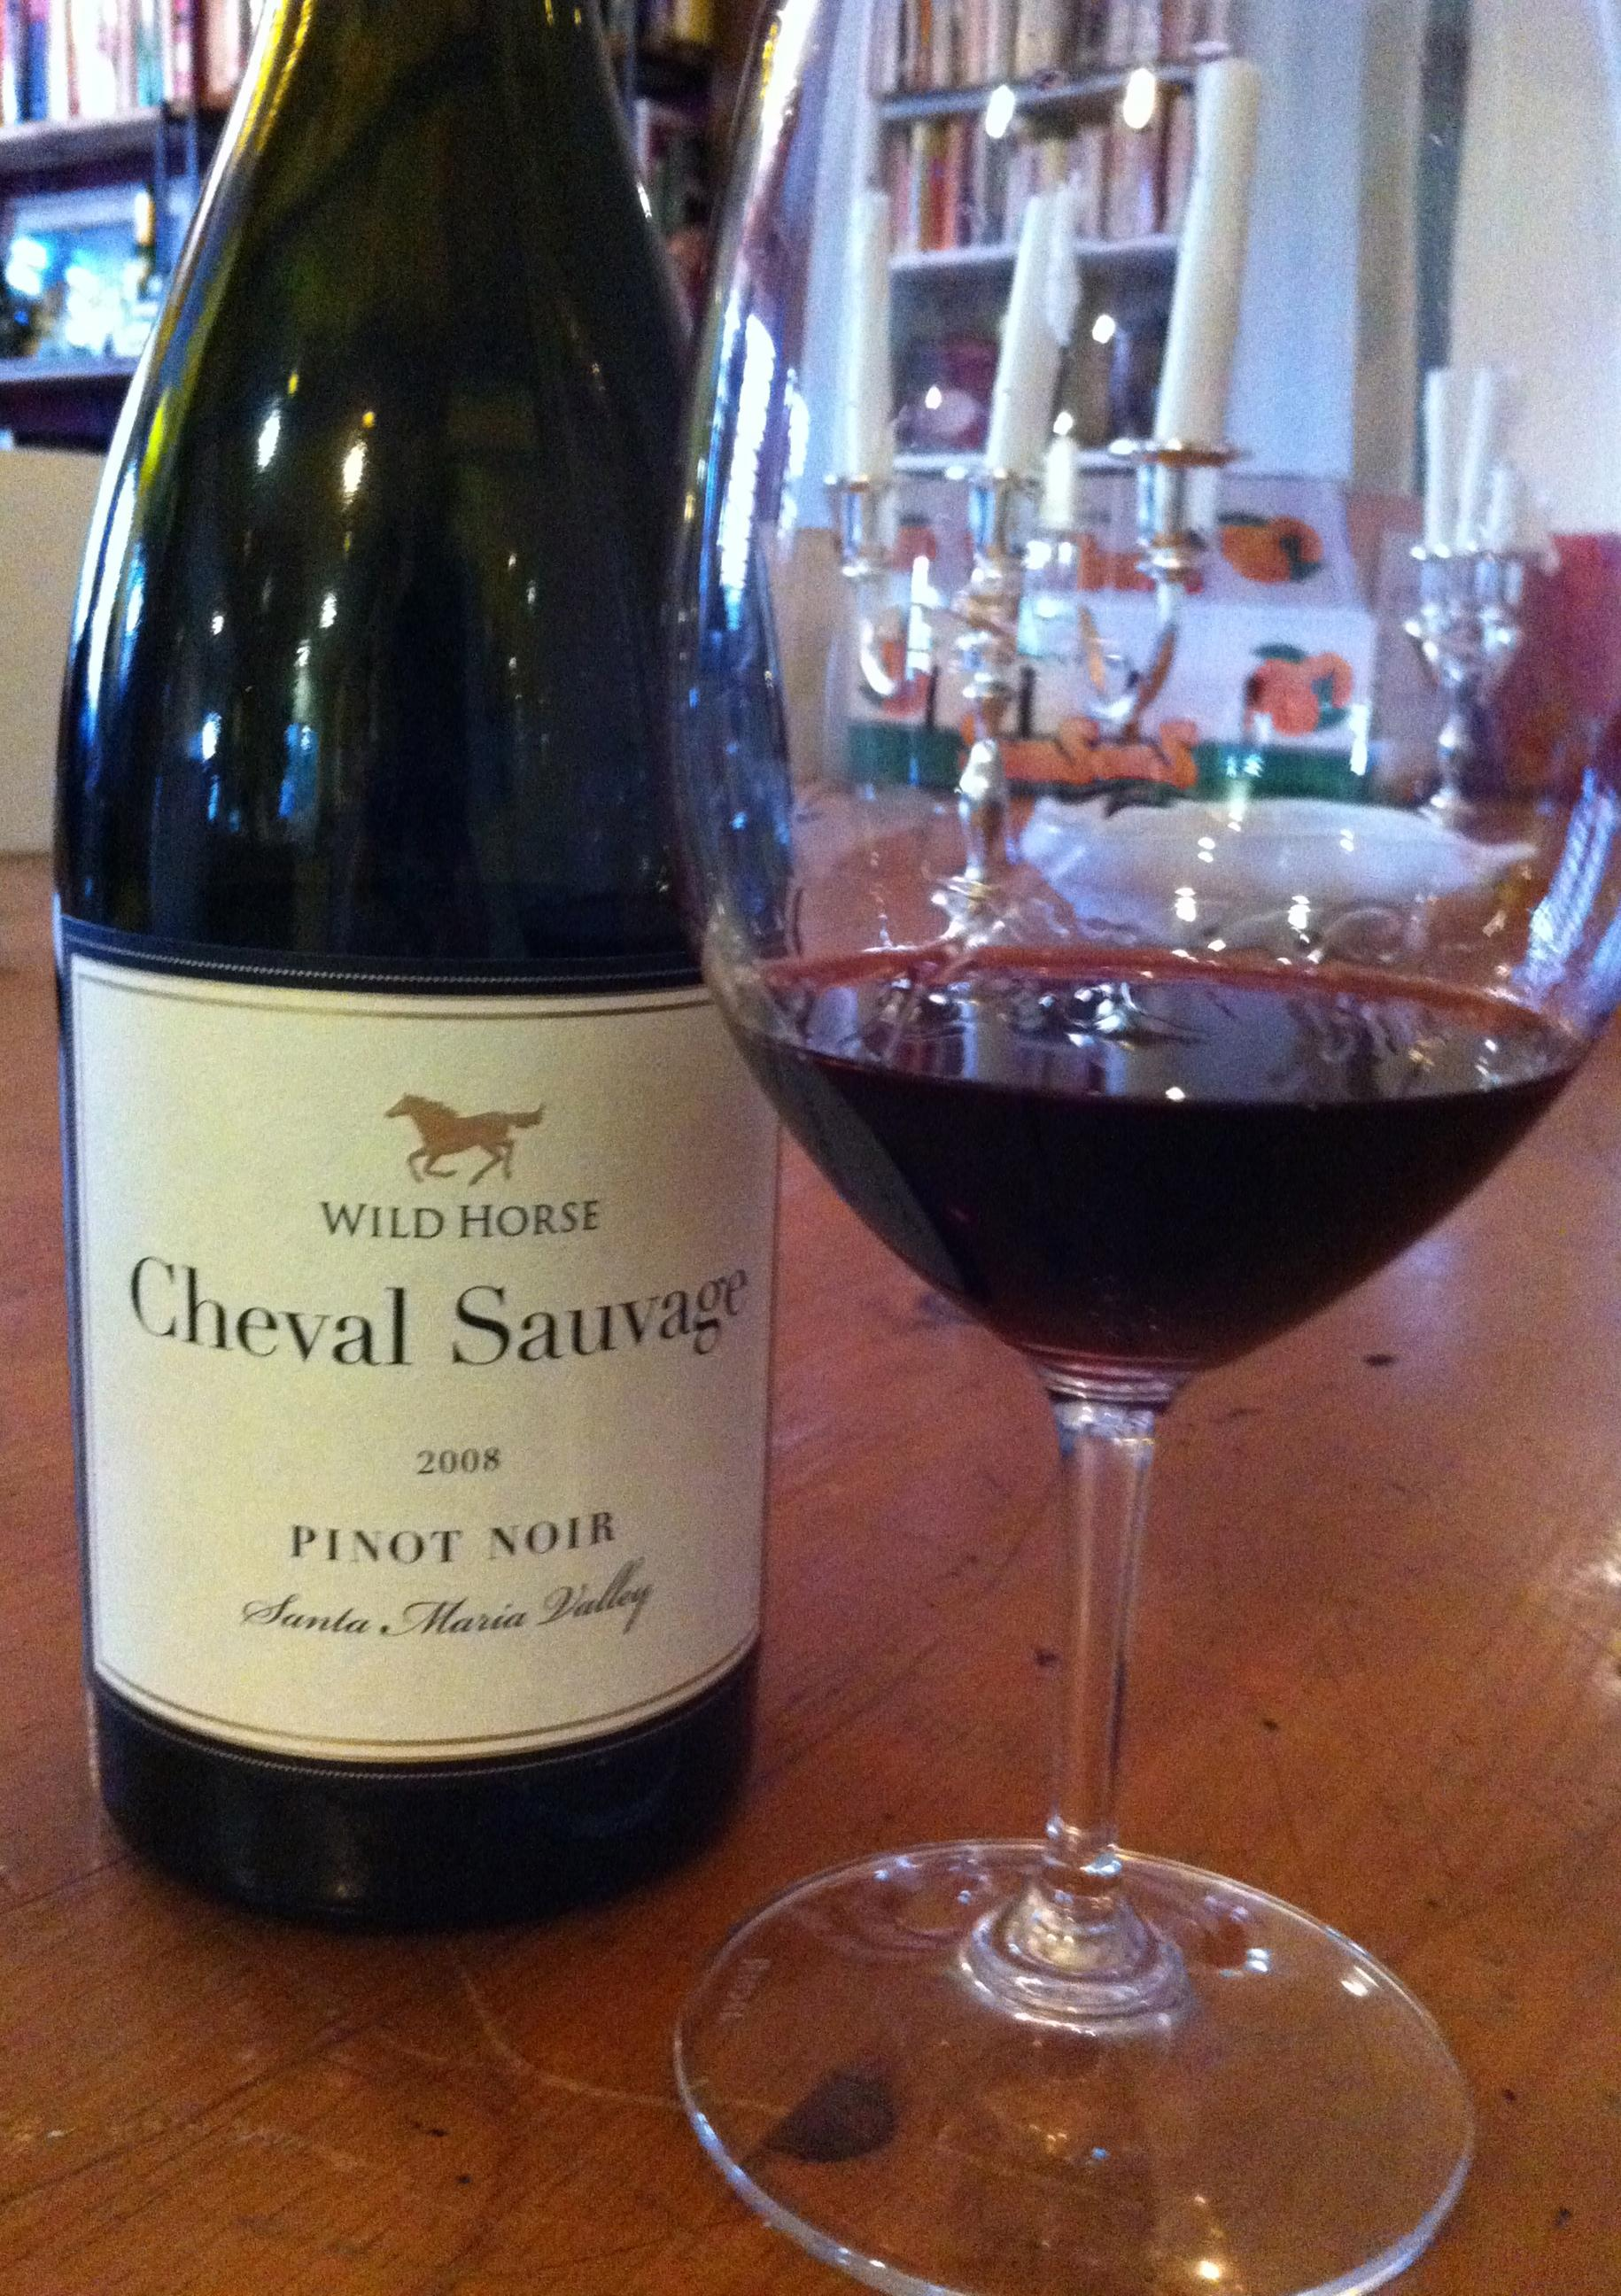 Wild Horse Cheval Sauvage Pinot Noir